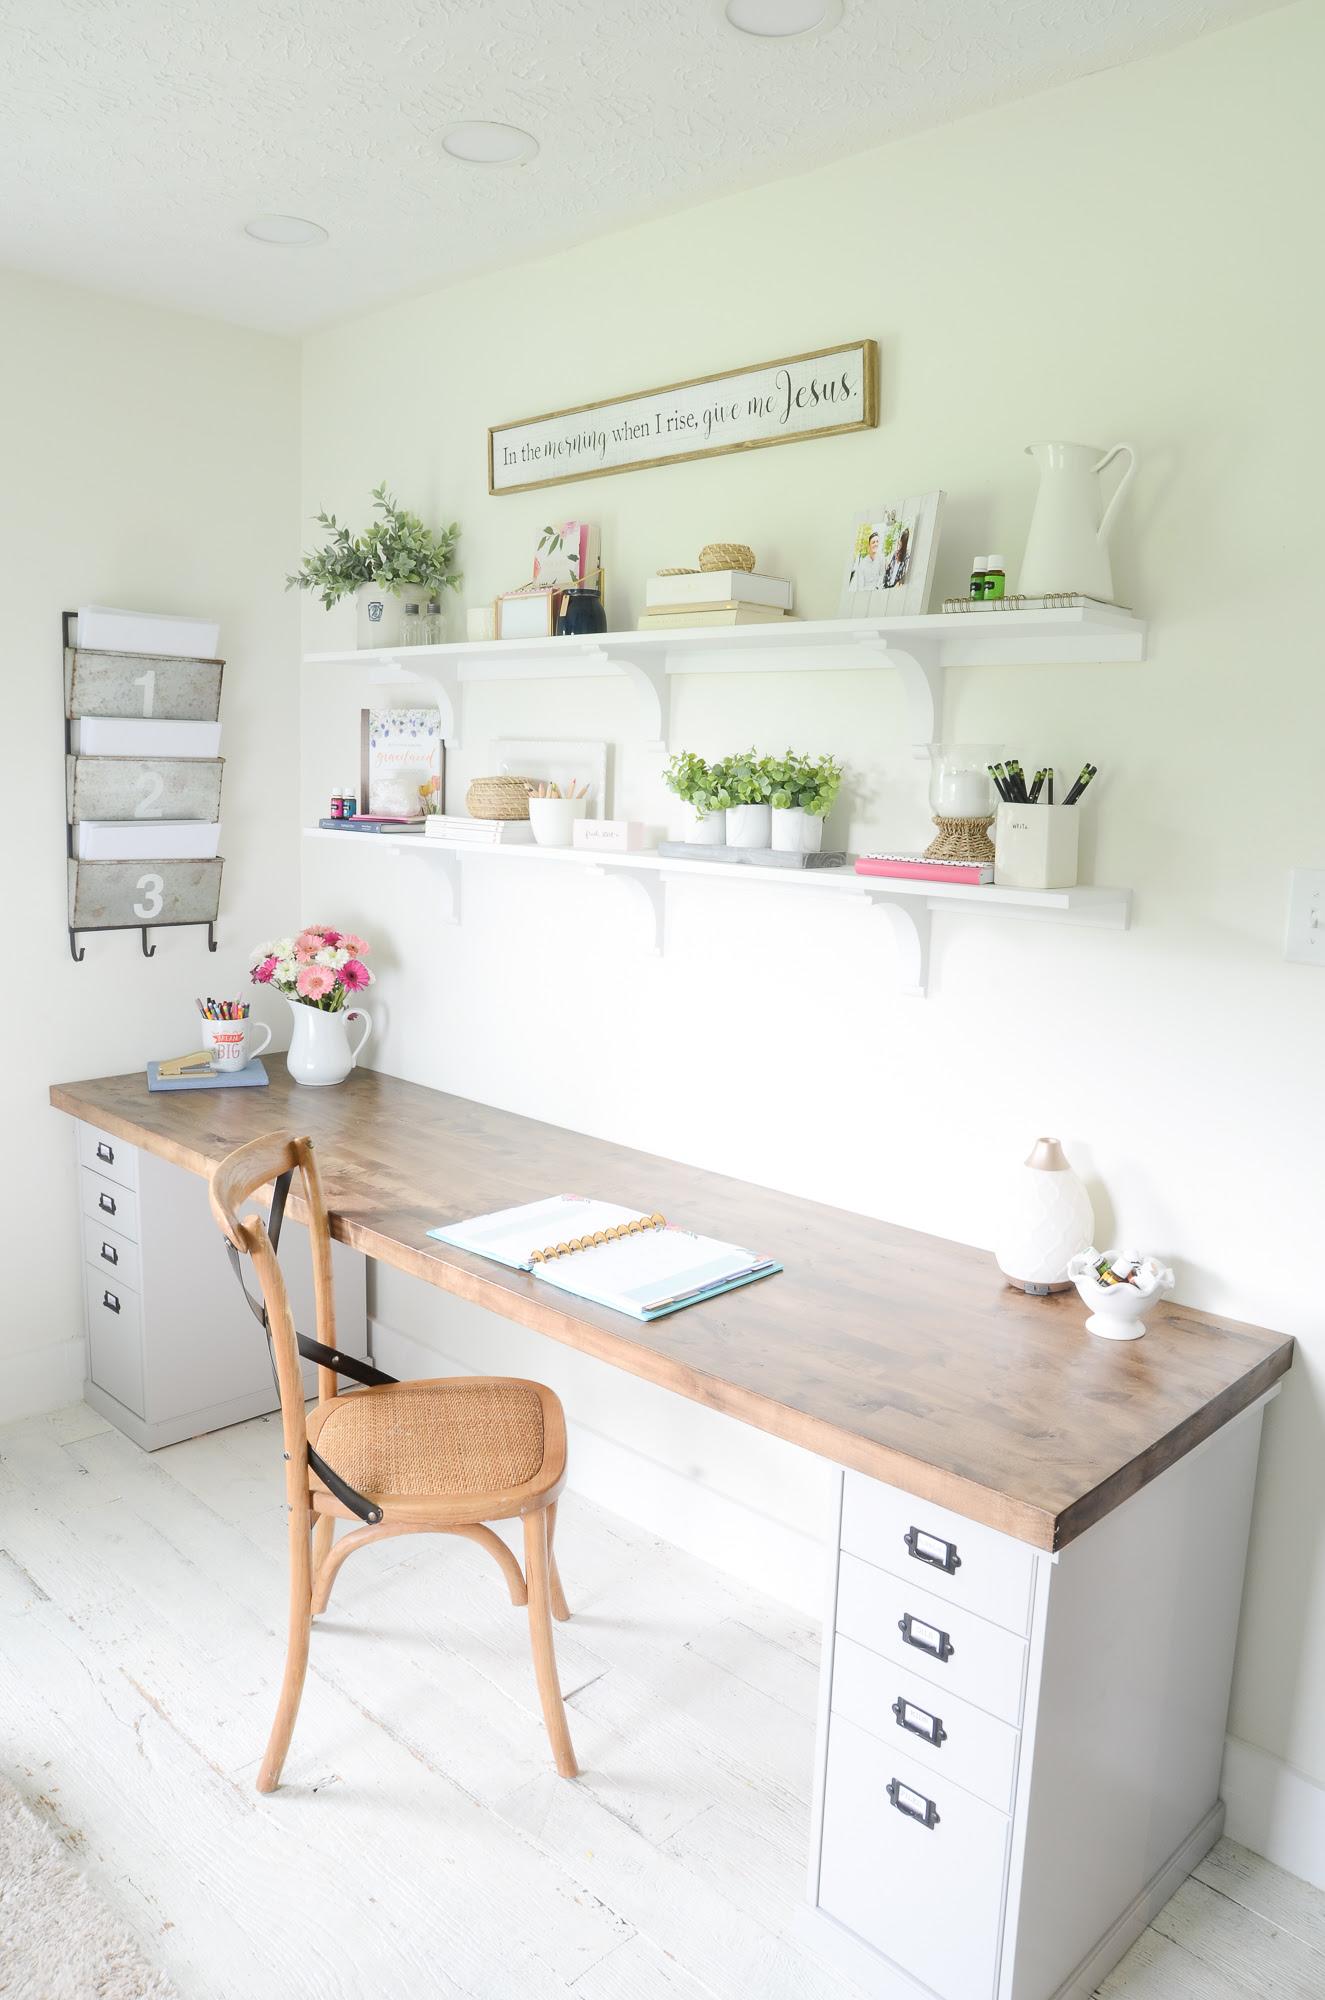 DIY Butcher Block Desk for my Home Office - Beneath My Heart